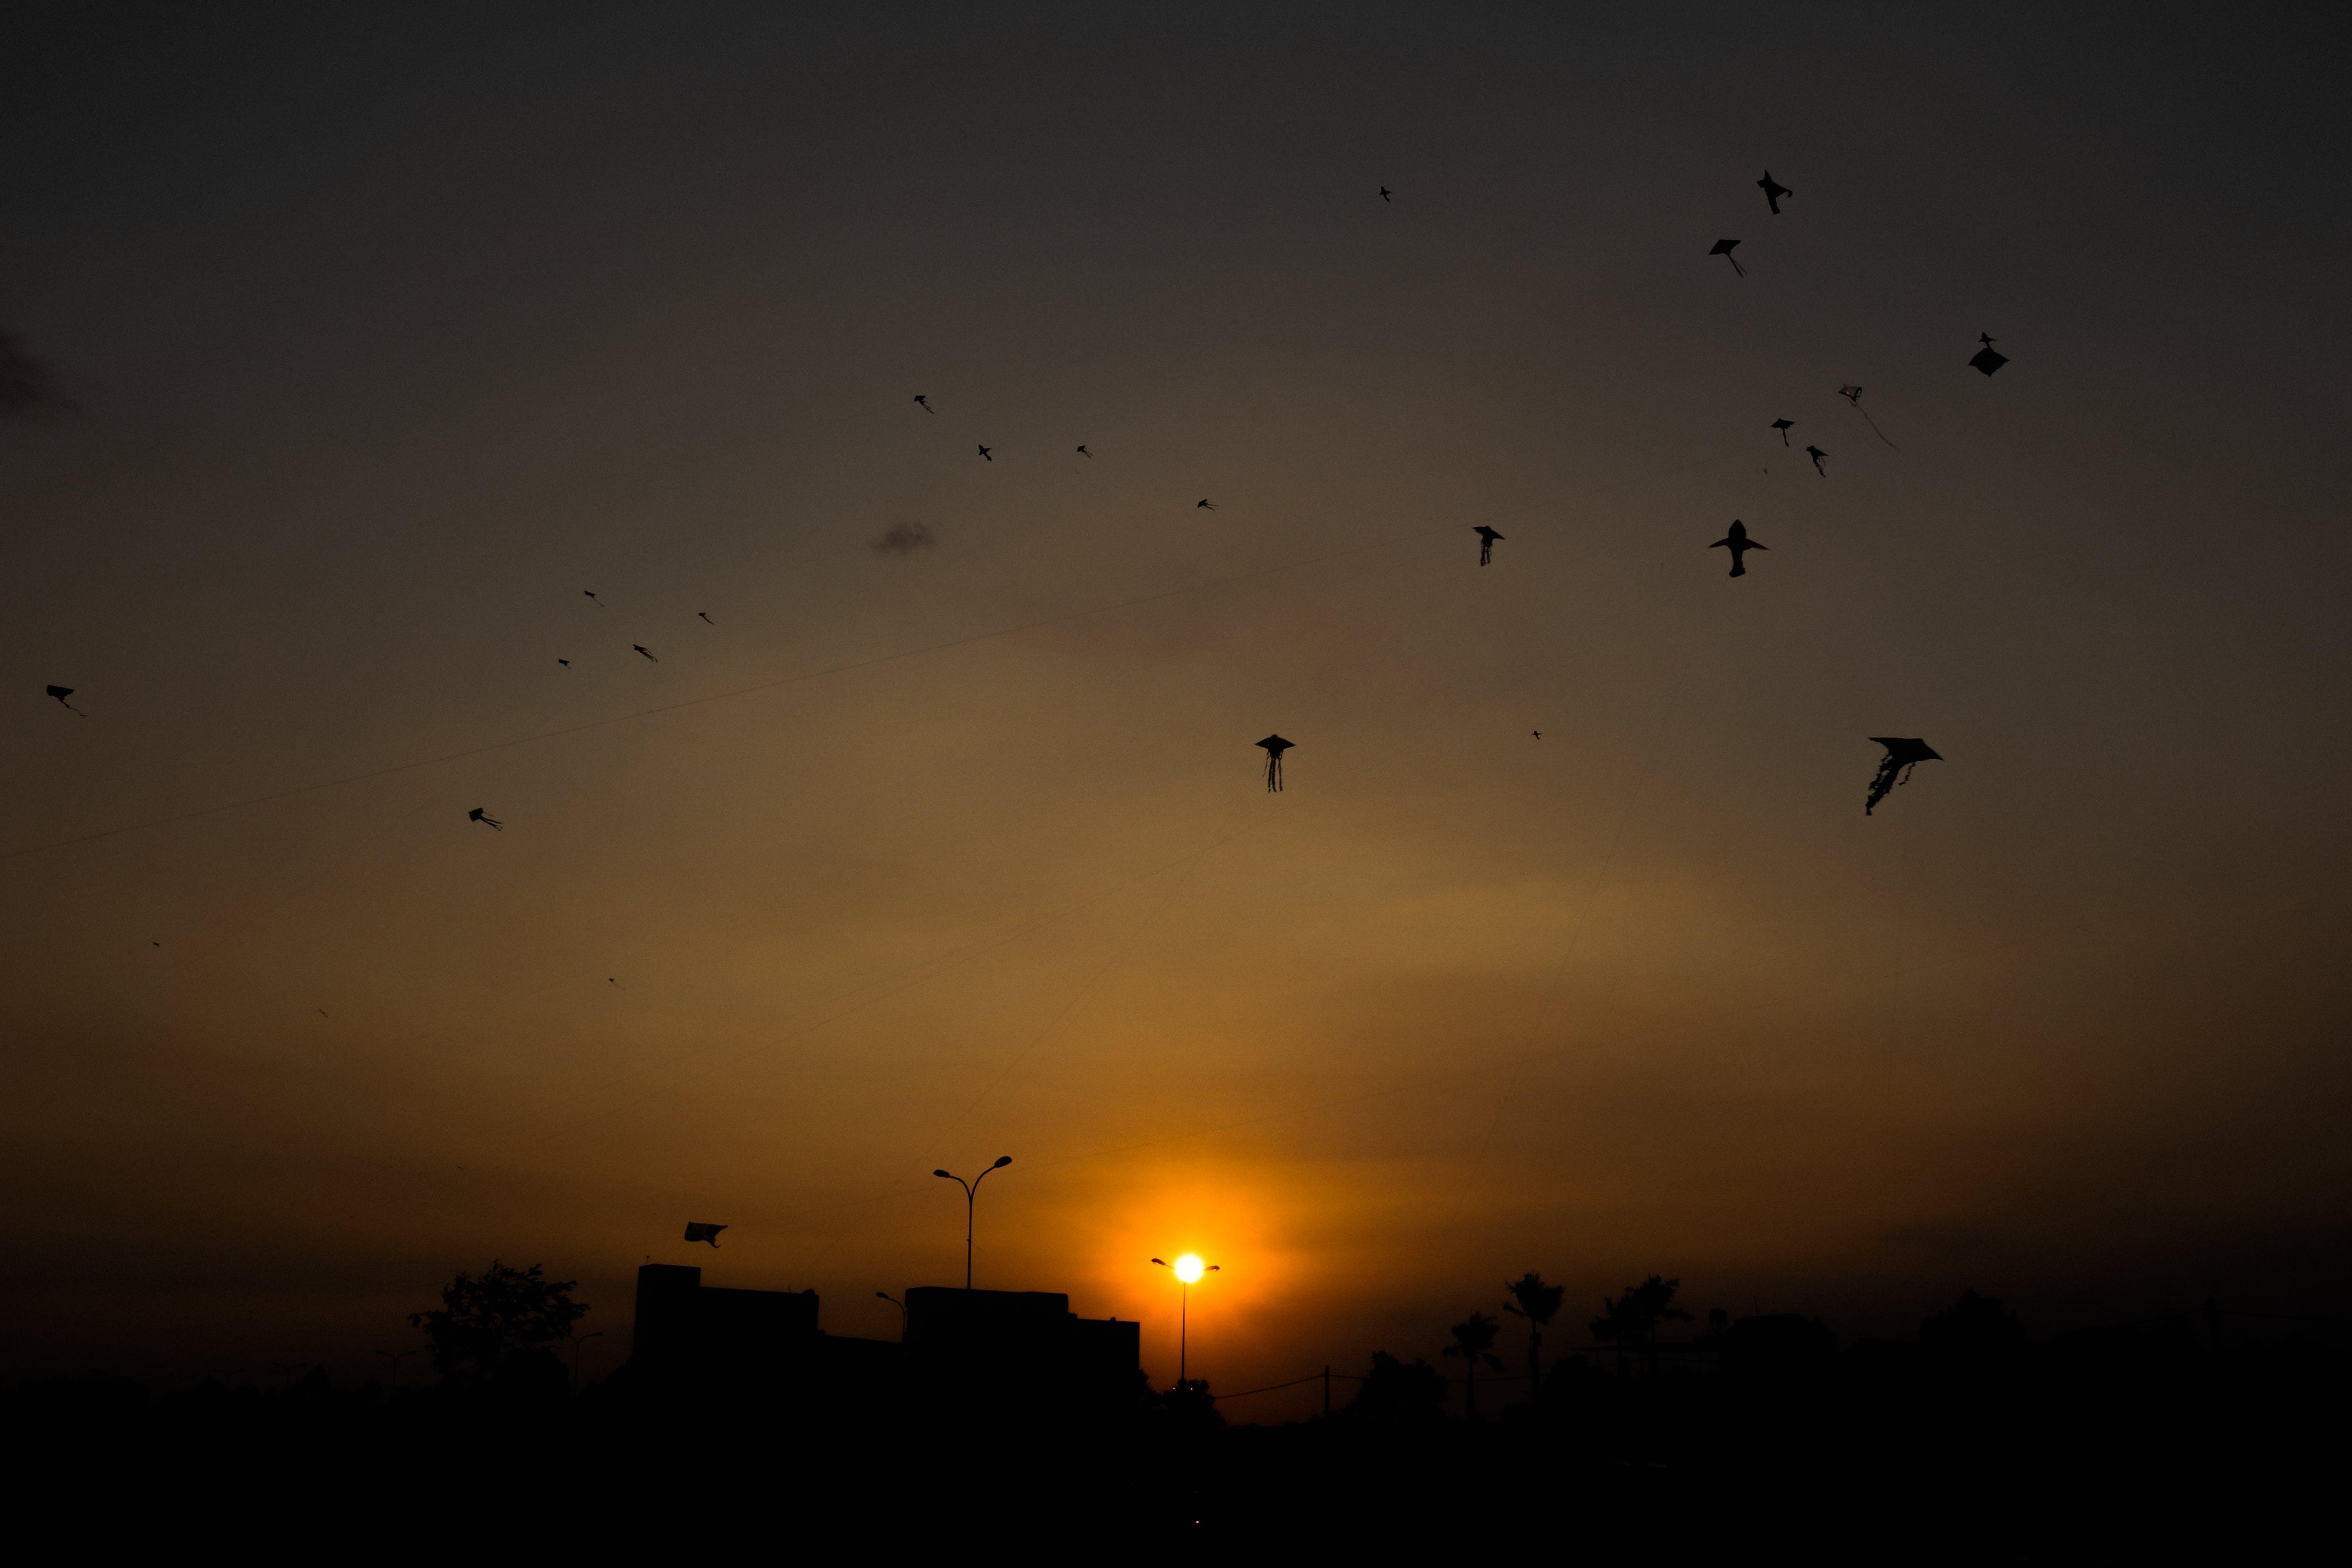 #sunset, #tracynguyen, #tracynguyenphotoraphy